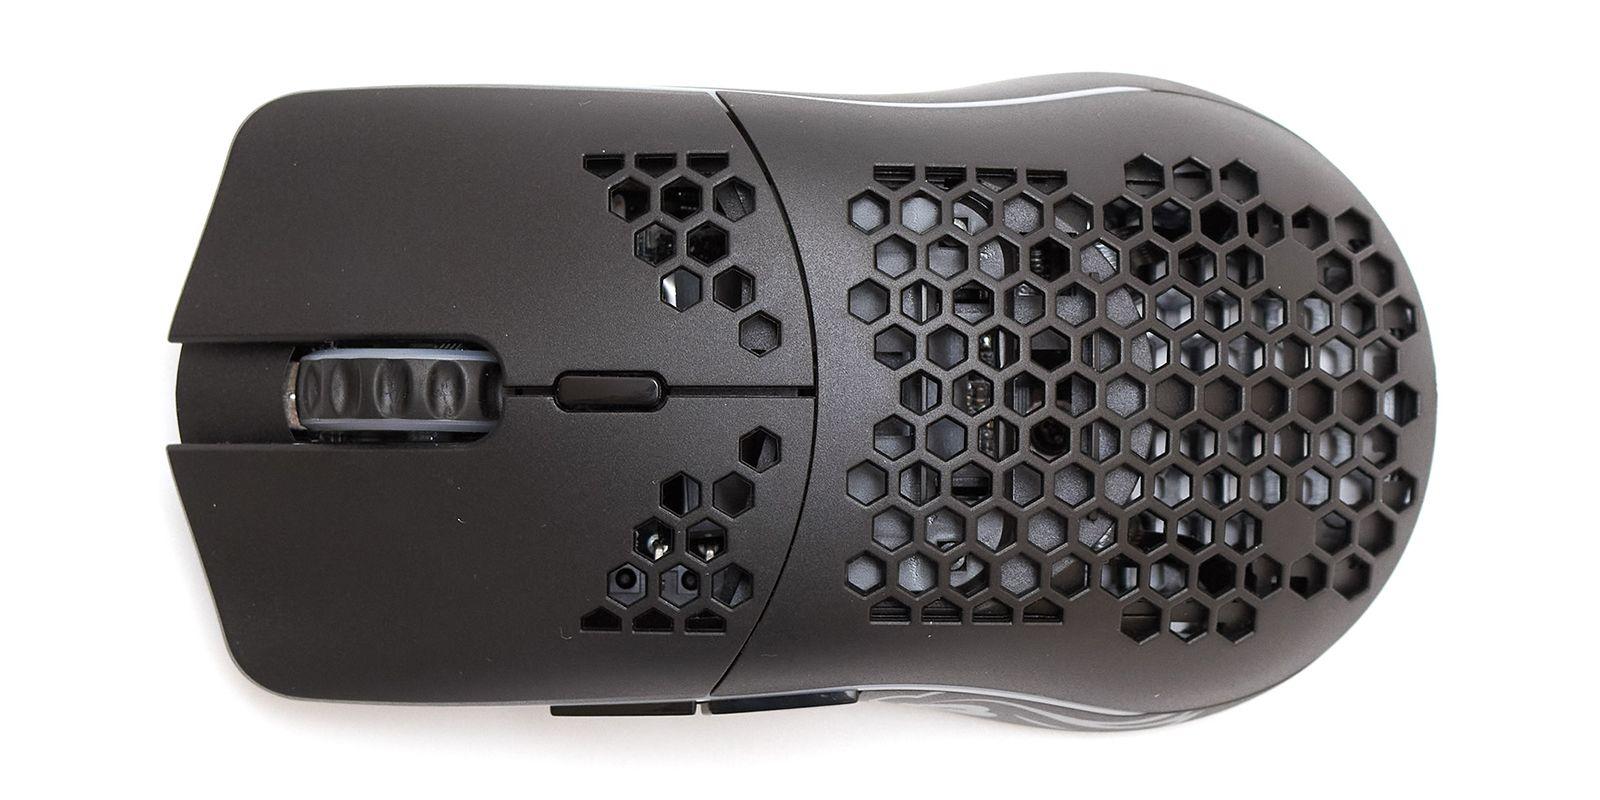 Мышь Glorious Model O Wireless. Фото 5